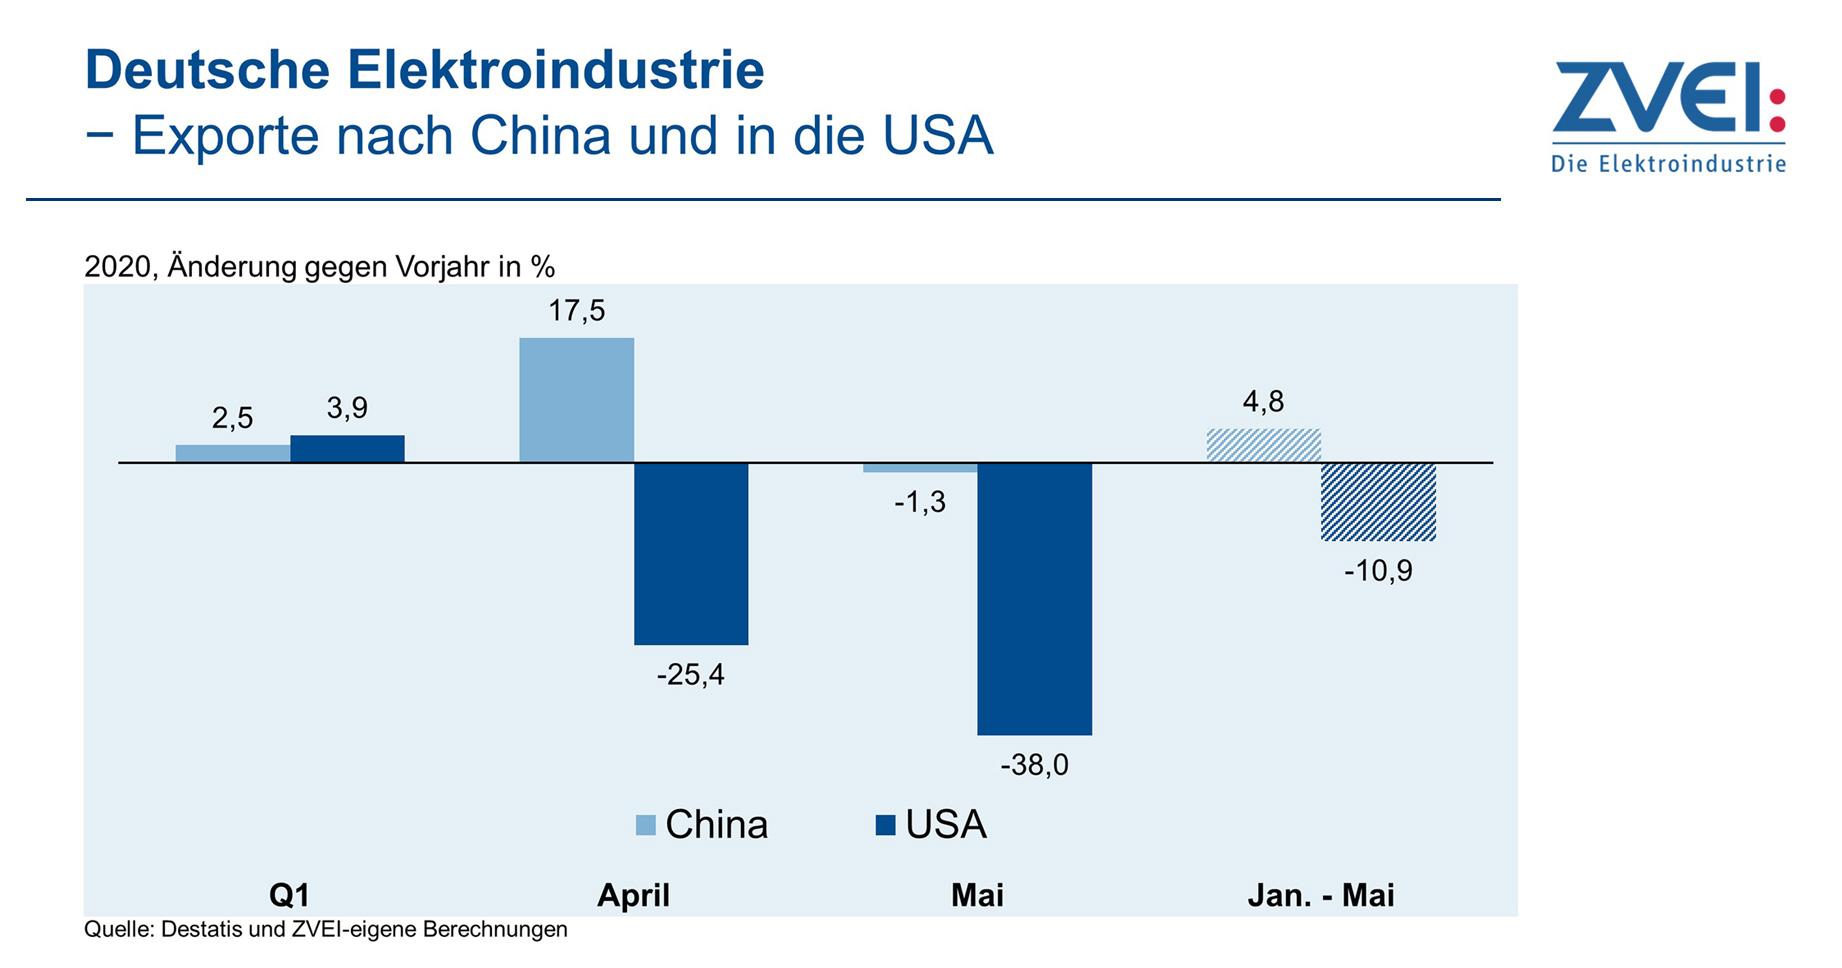 ZVEI Klima-Exporte China und USA